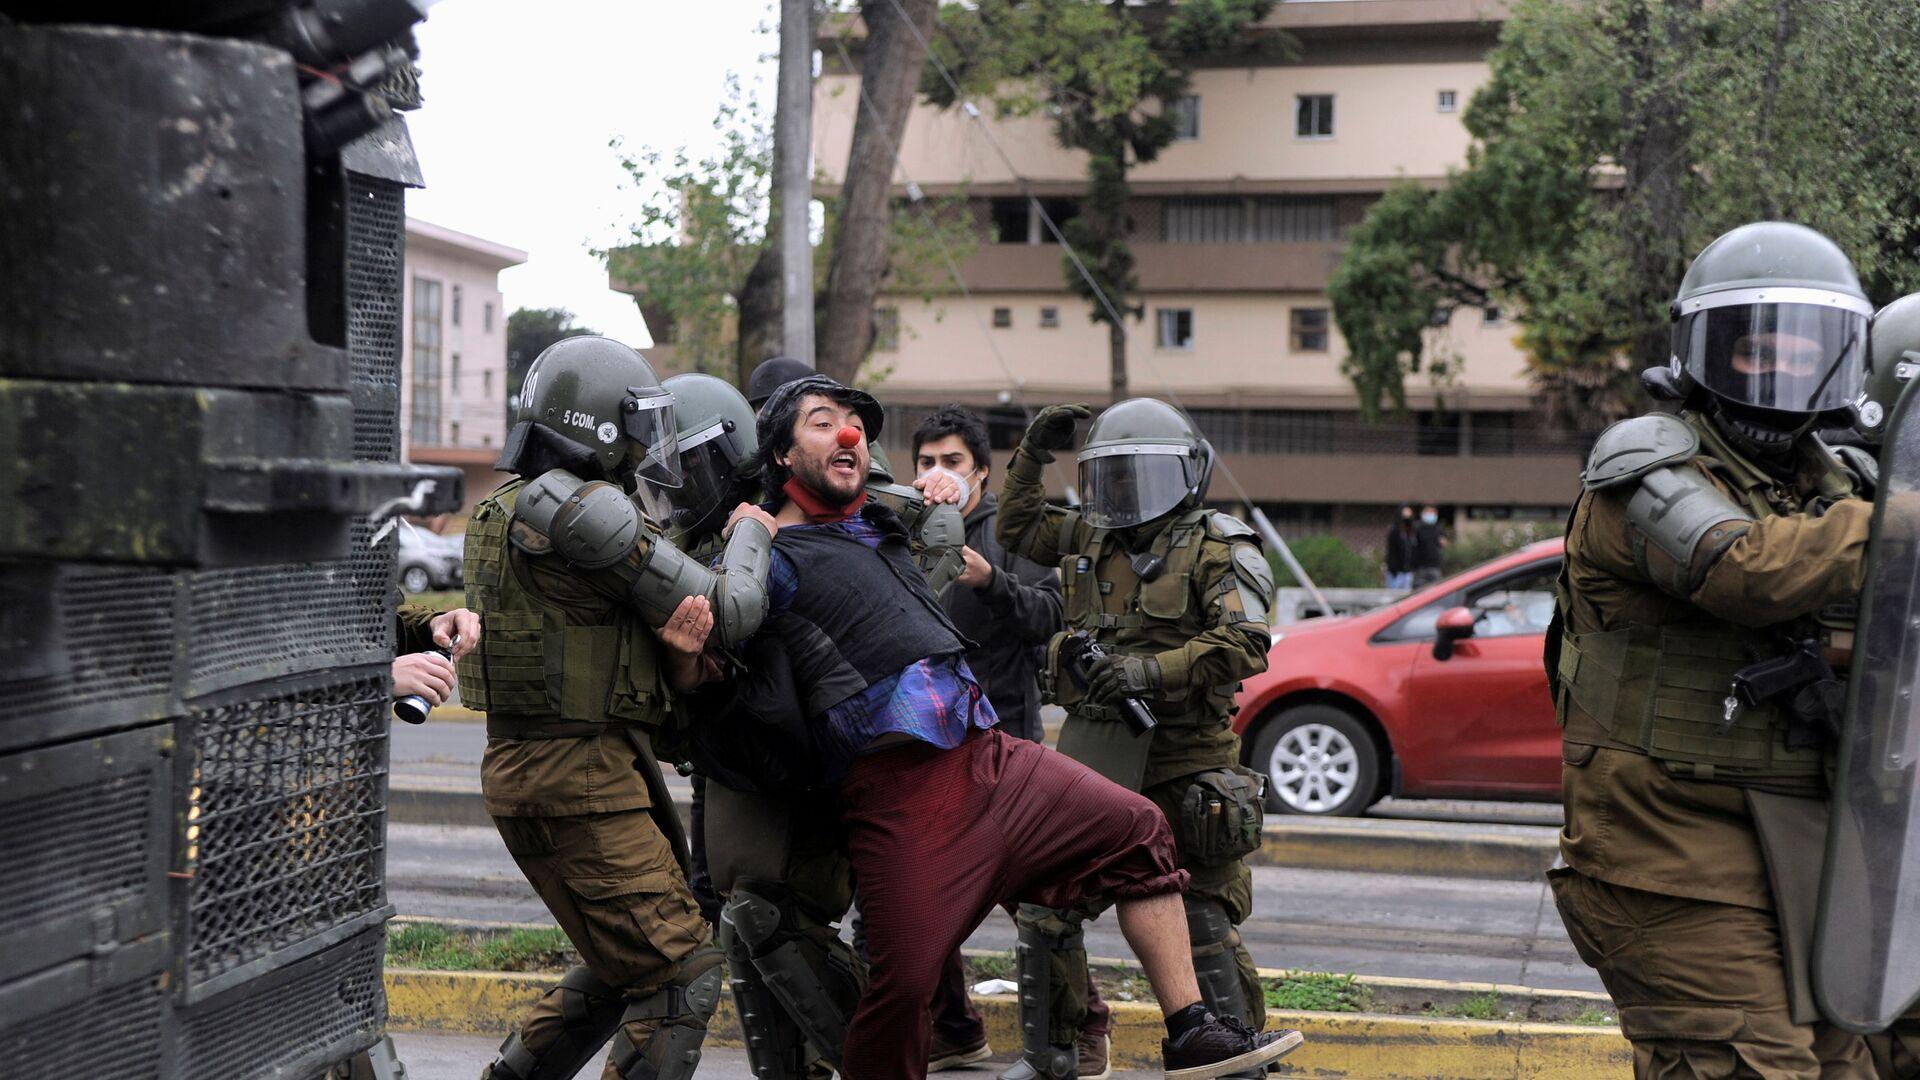 Policía chilena edurante las protestas - Sputnik Mundo, 1920, 15.07.2021